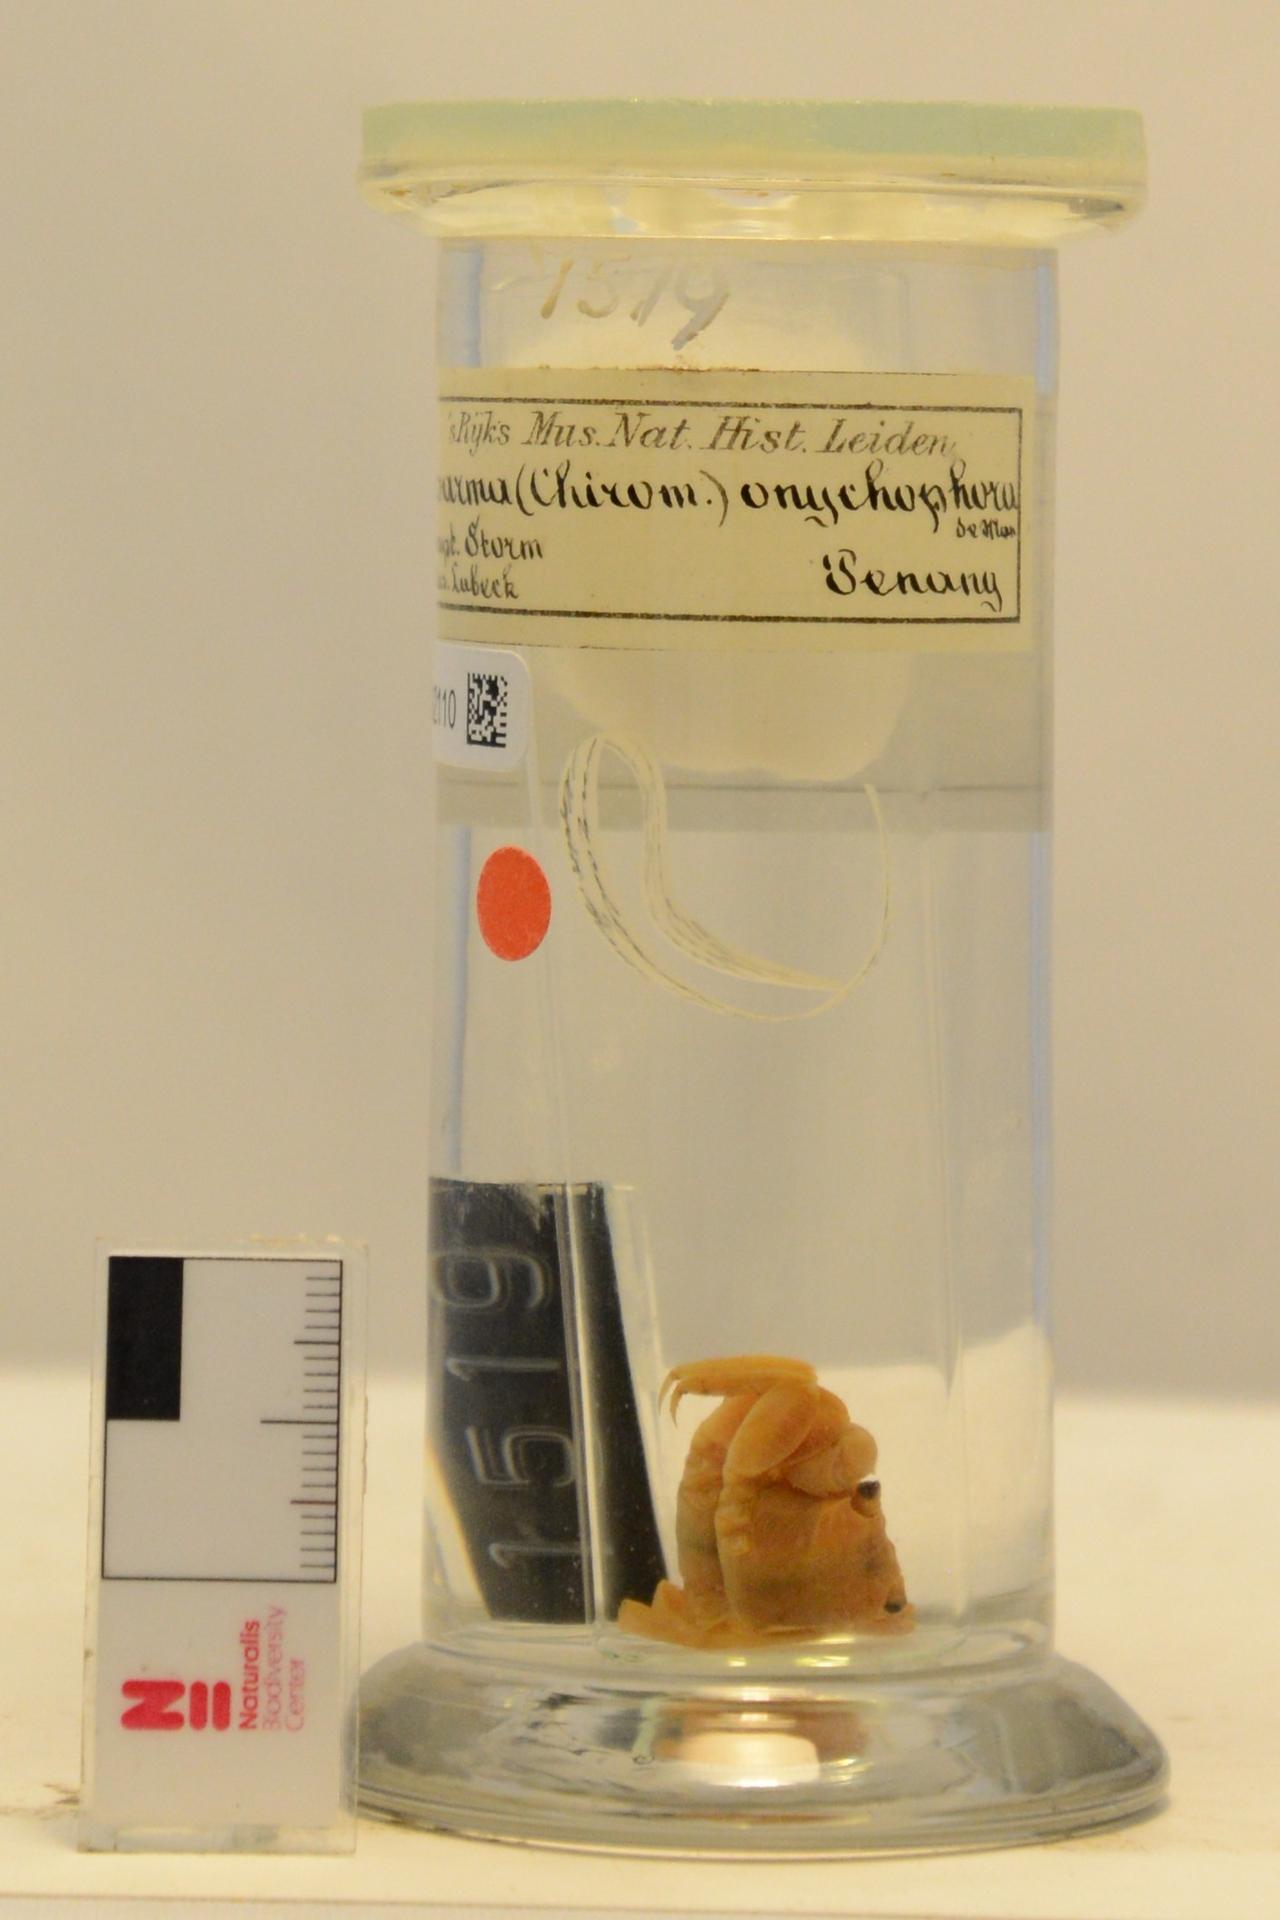 RMNH.CRUS.D.1519 | Sesarma (Chiromantes) onychophora De Man, 1895